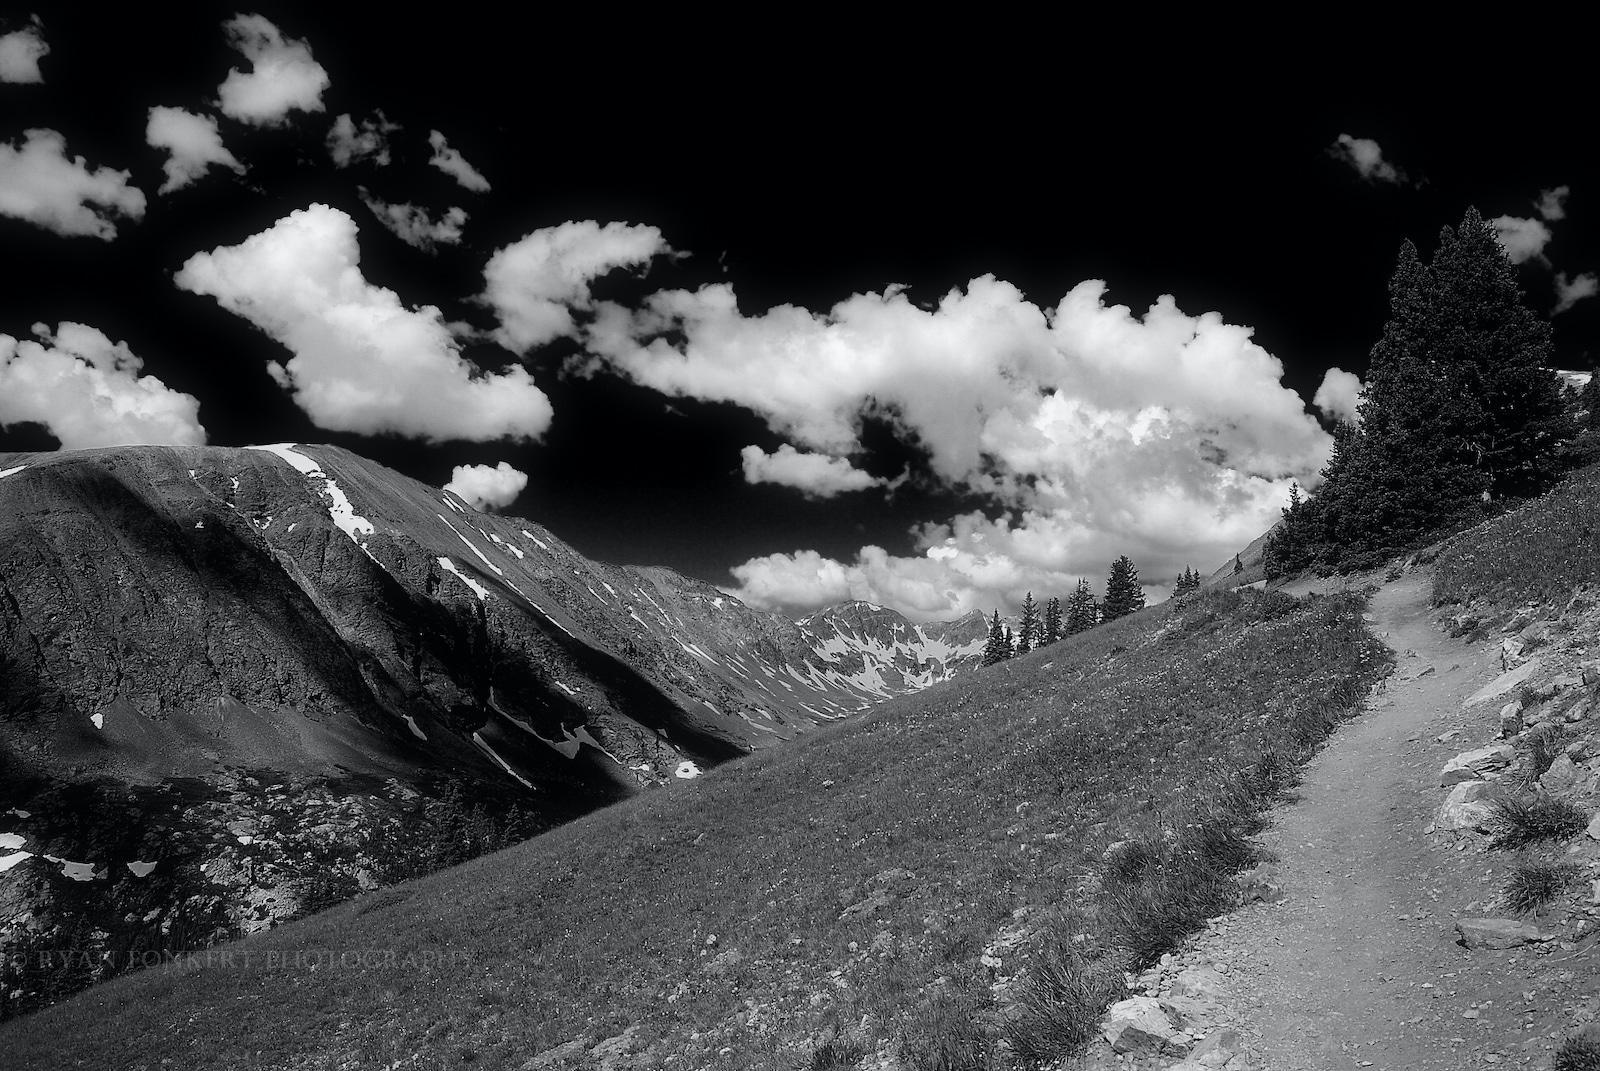 Quandary Peak Hiking Trail Colorado